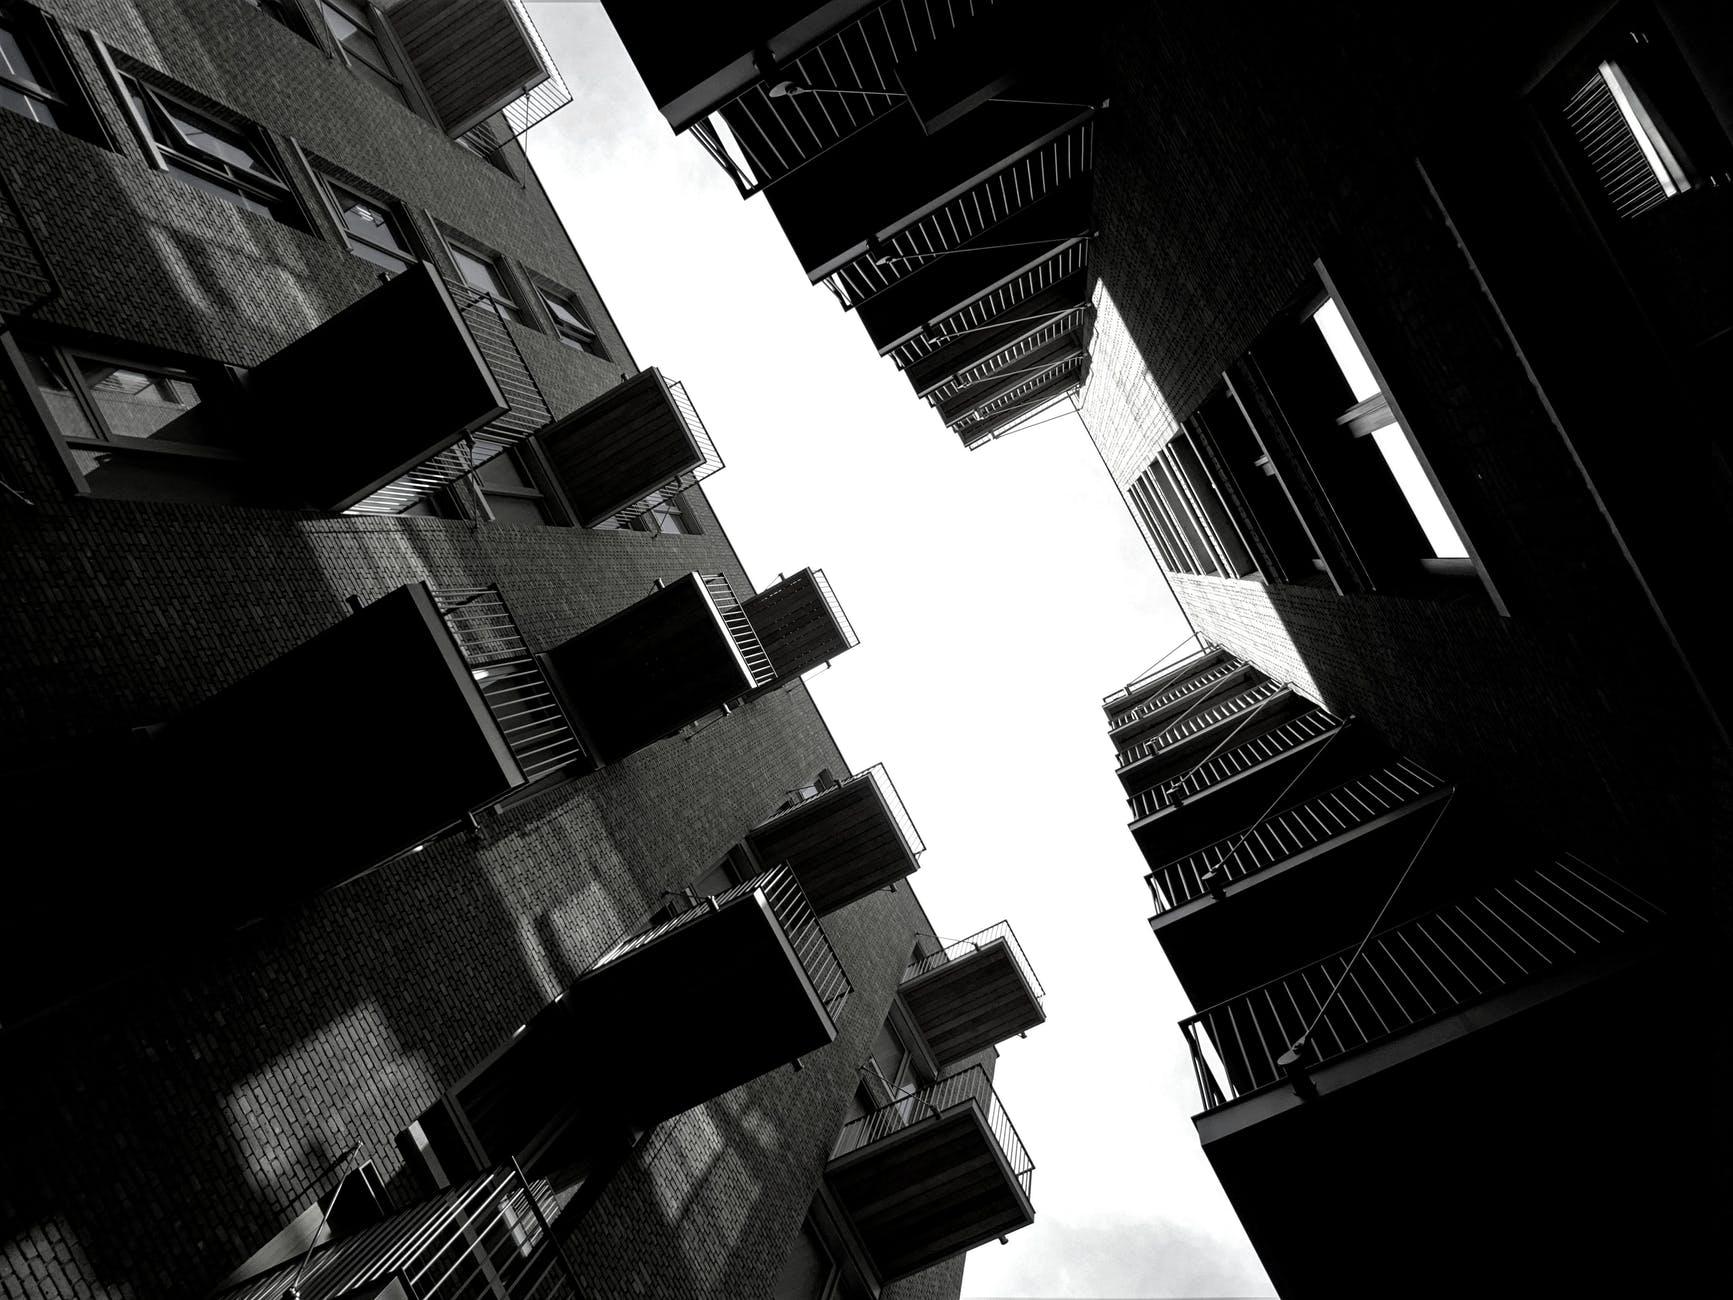 architecture balcony black and white black and white